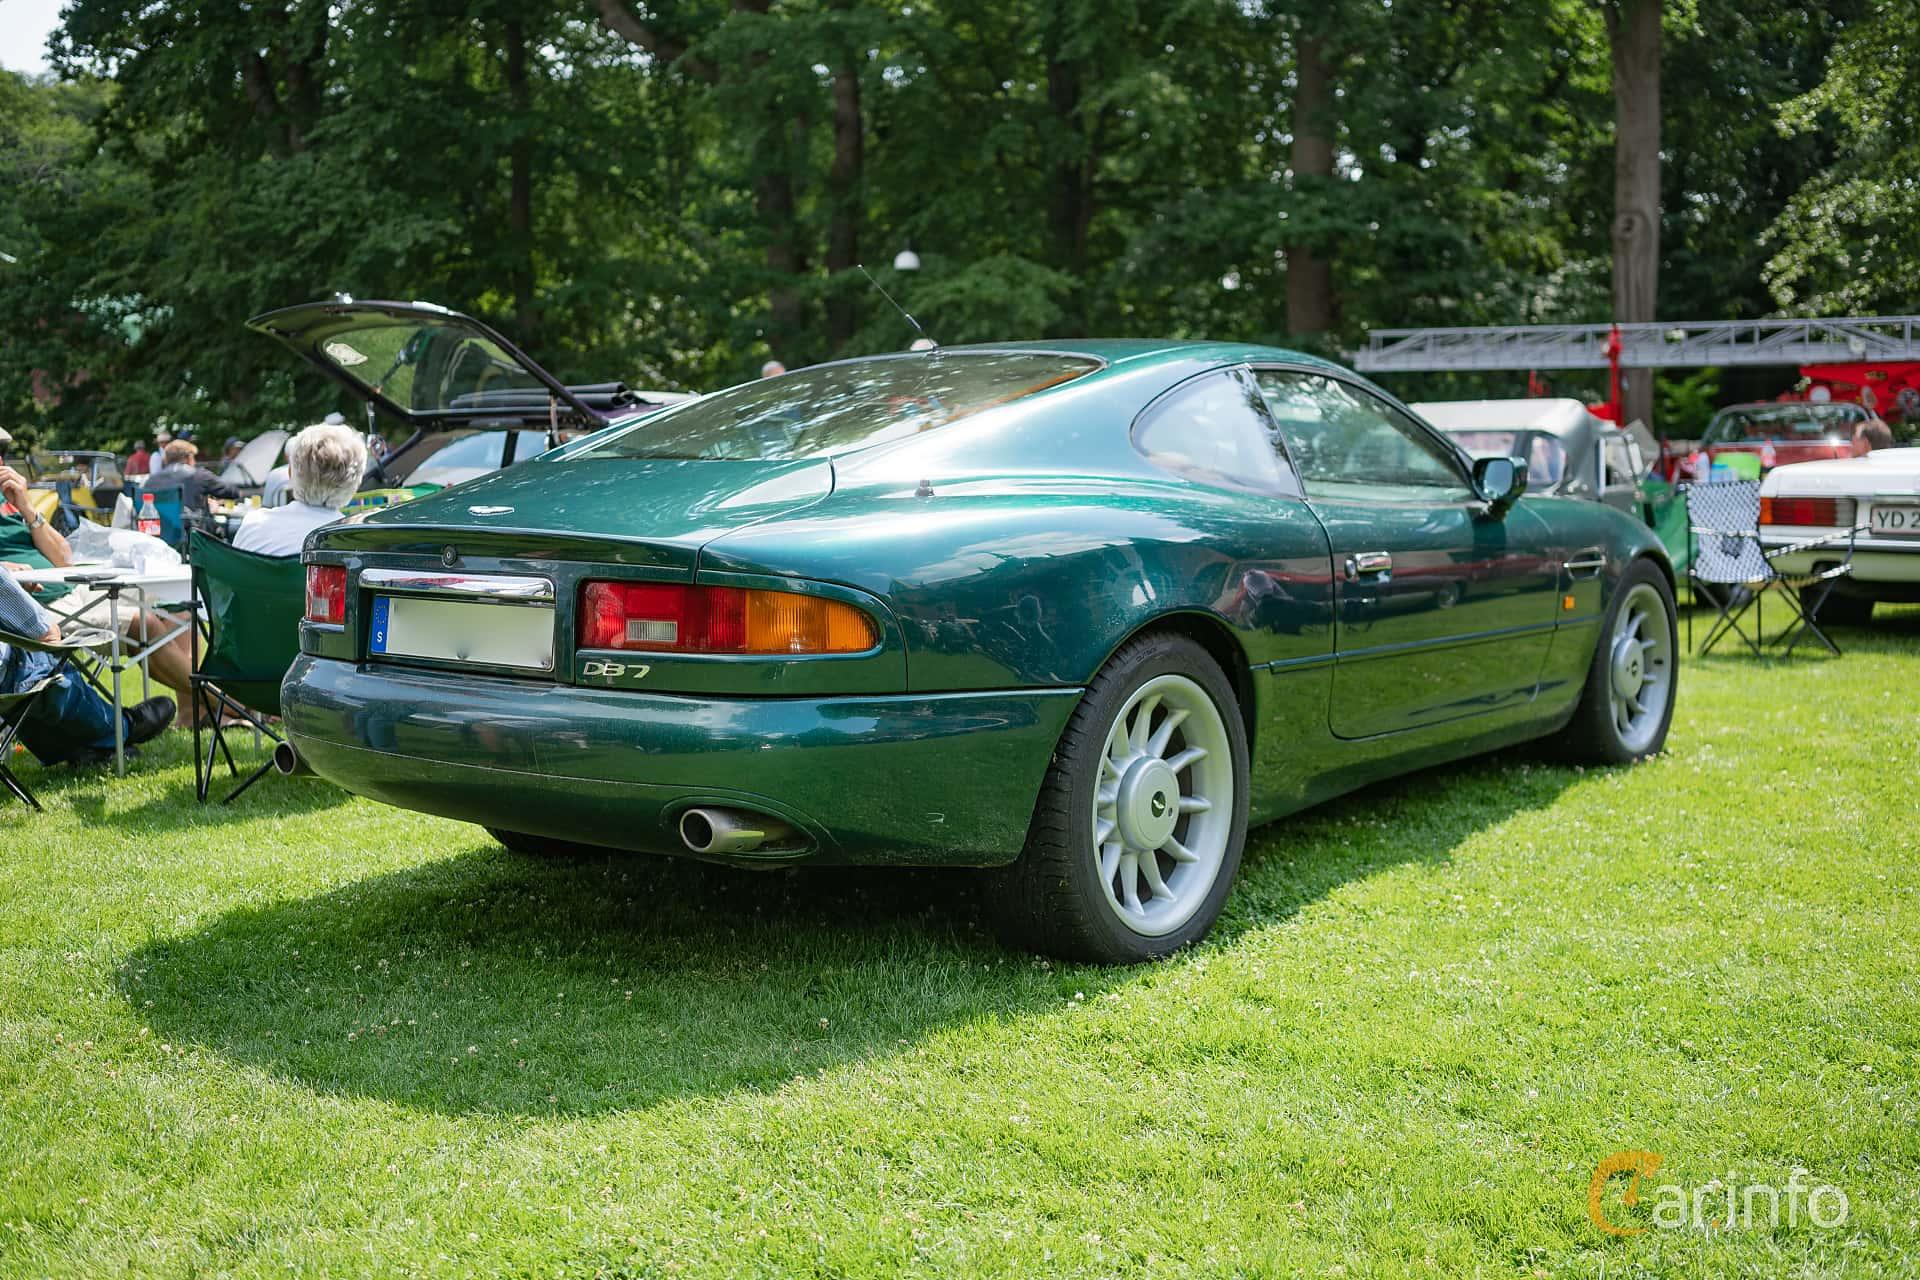 Aston Martin Db7 3 2 Automatic 340hp 1995